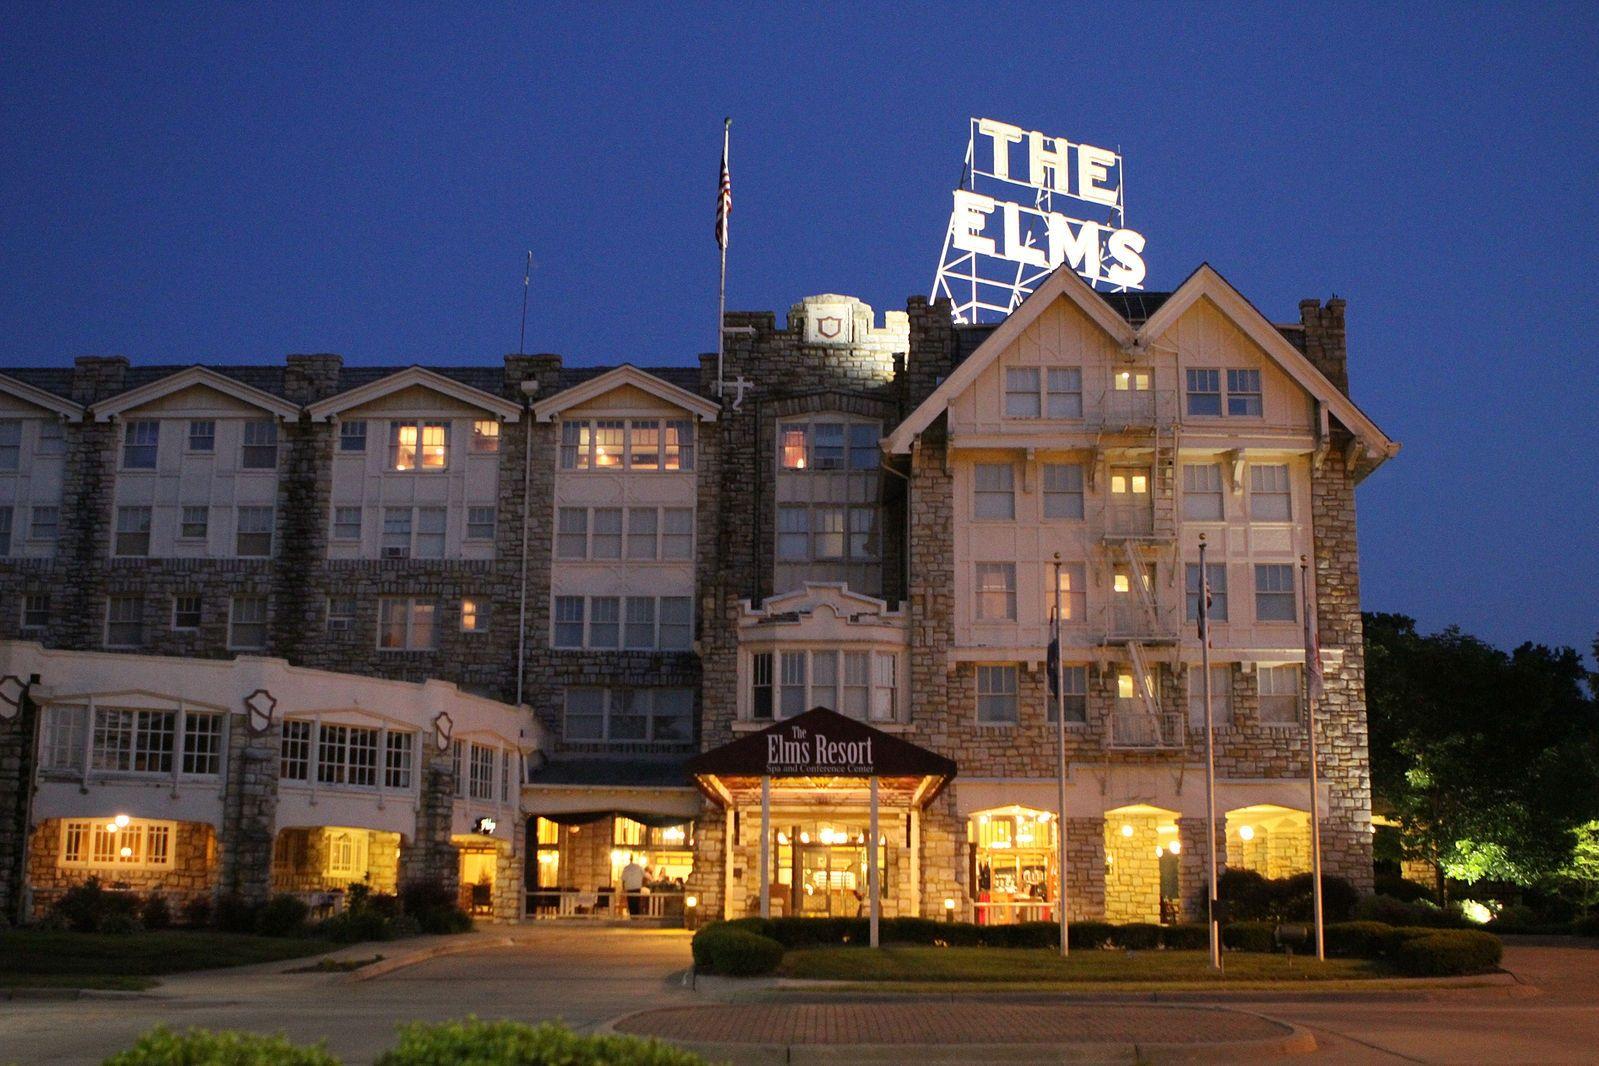 Elms Resort and Spa (Excelsior Springs, MO) - Resort